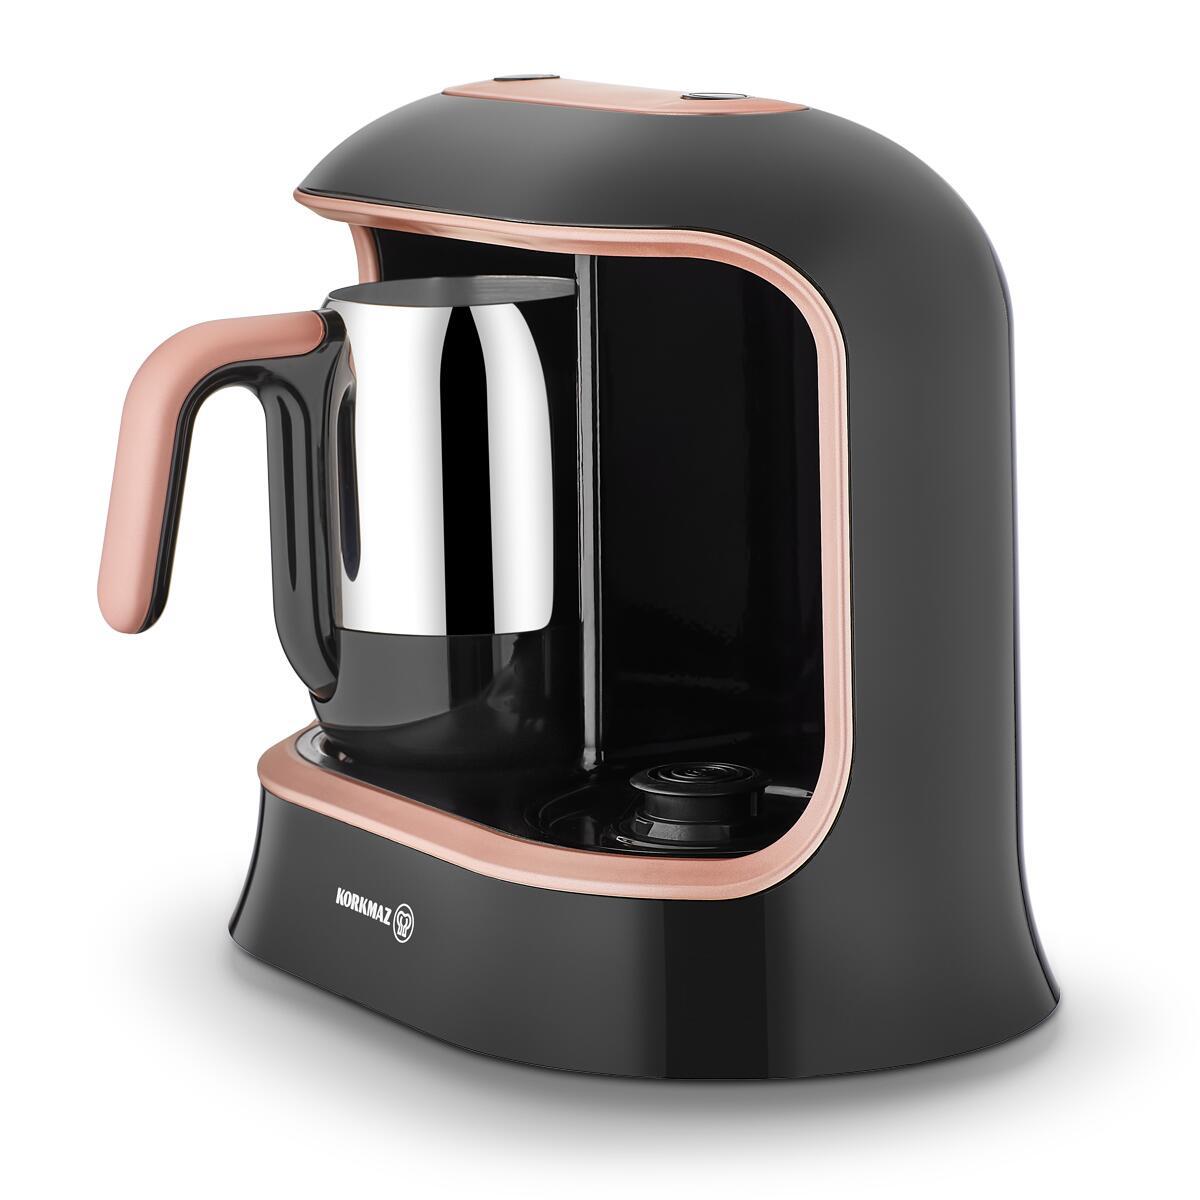 Korkmaz Kahvekolik Twin Siyah/Rosagold Otomatik Kahve Makinesi